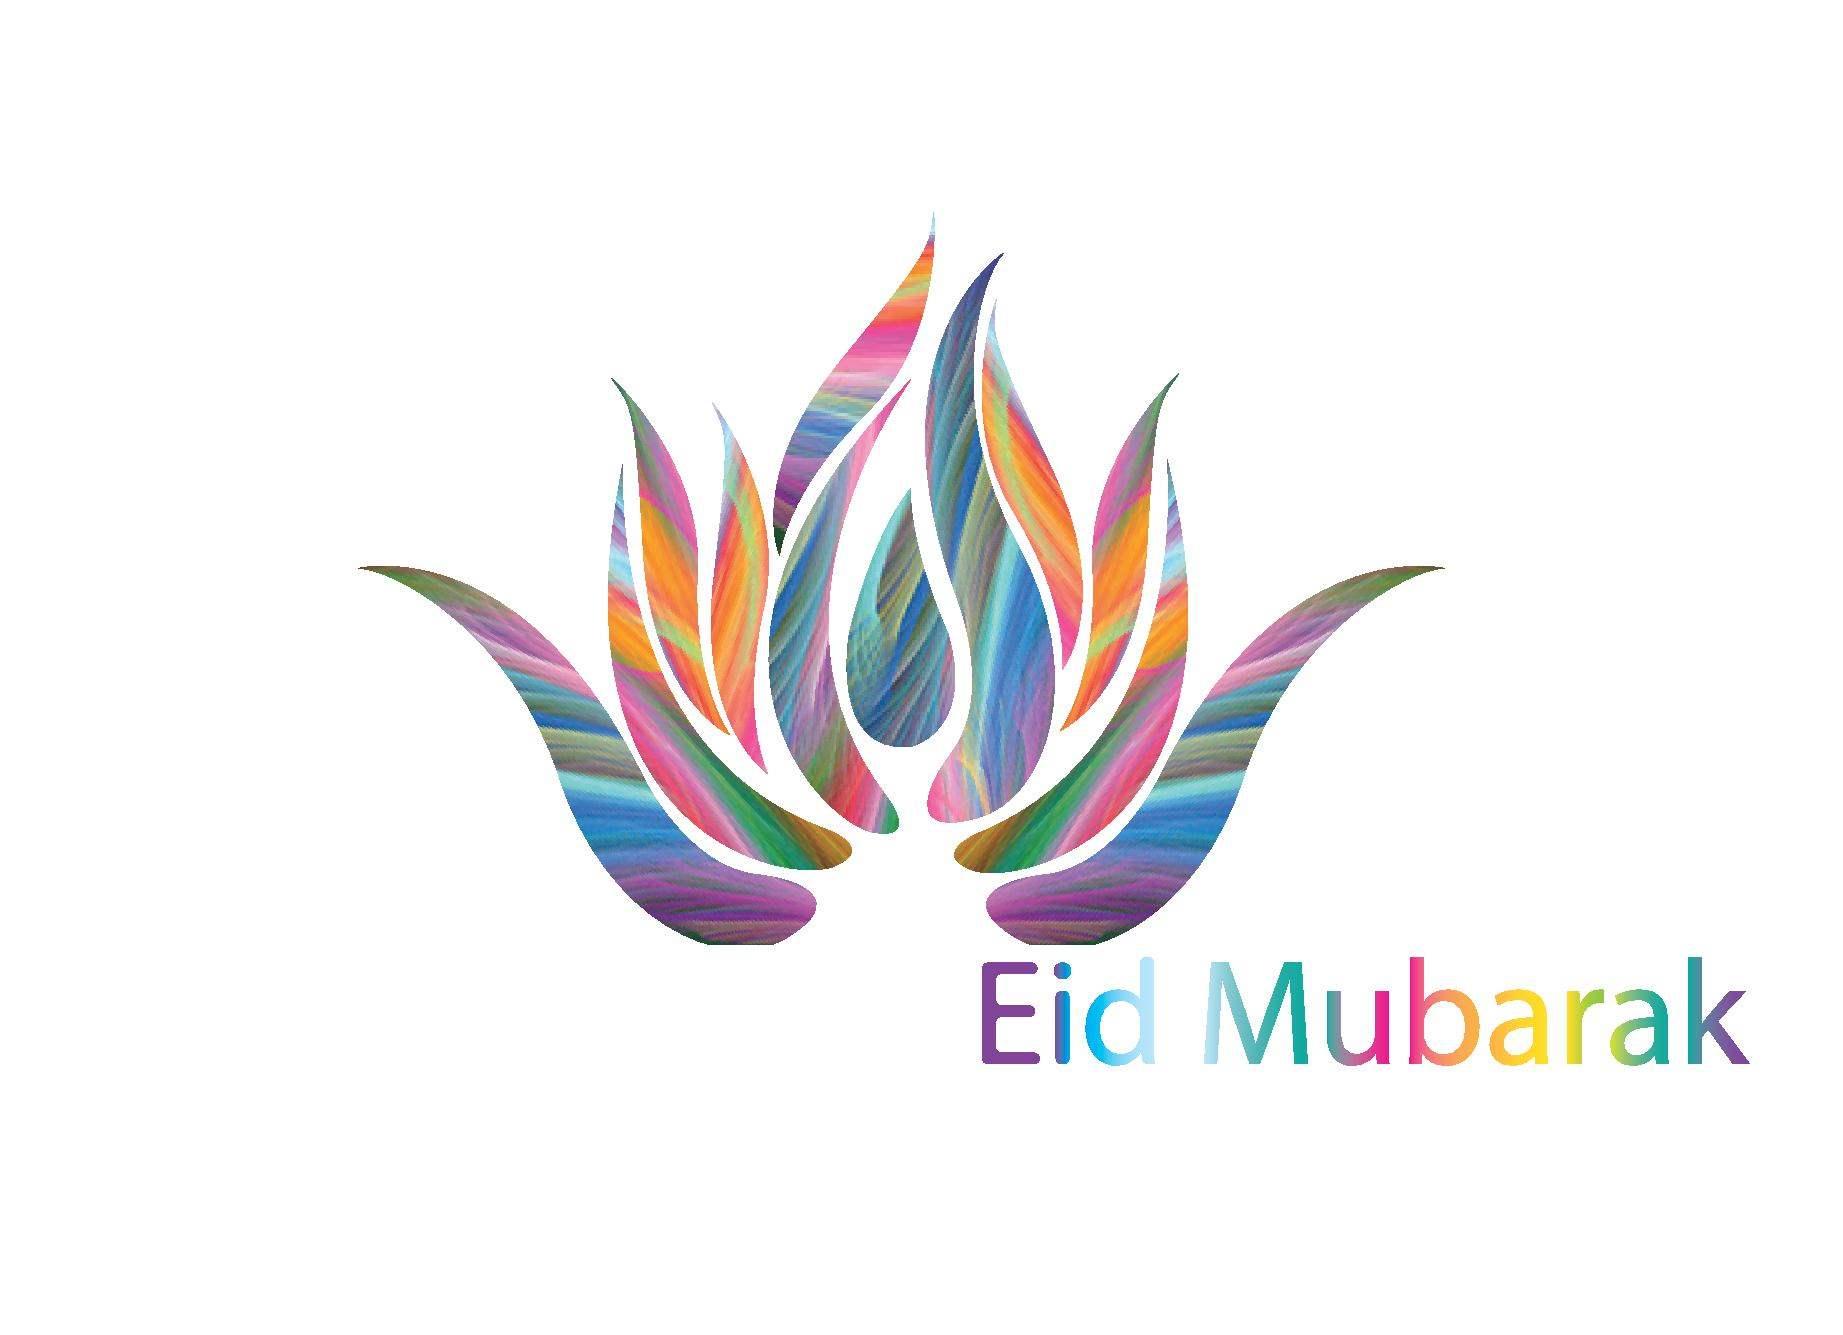 eid mubarak desktop wallpaper